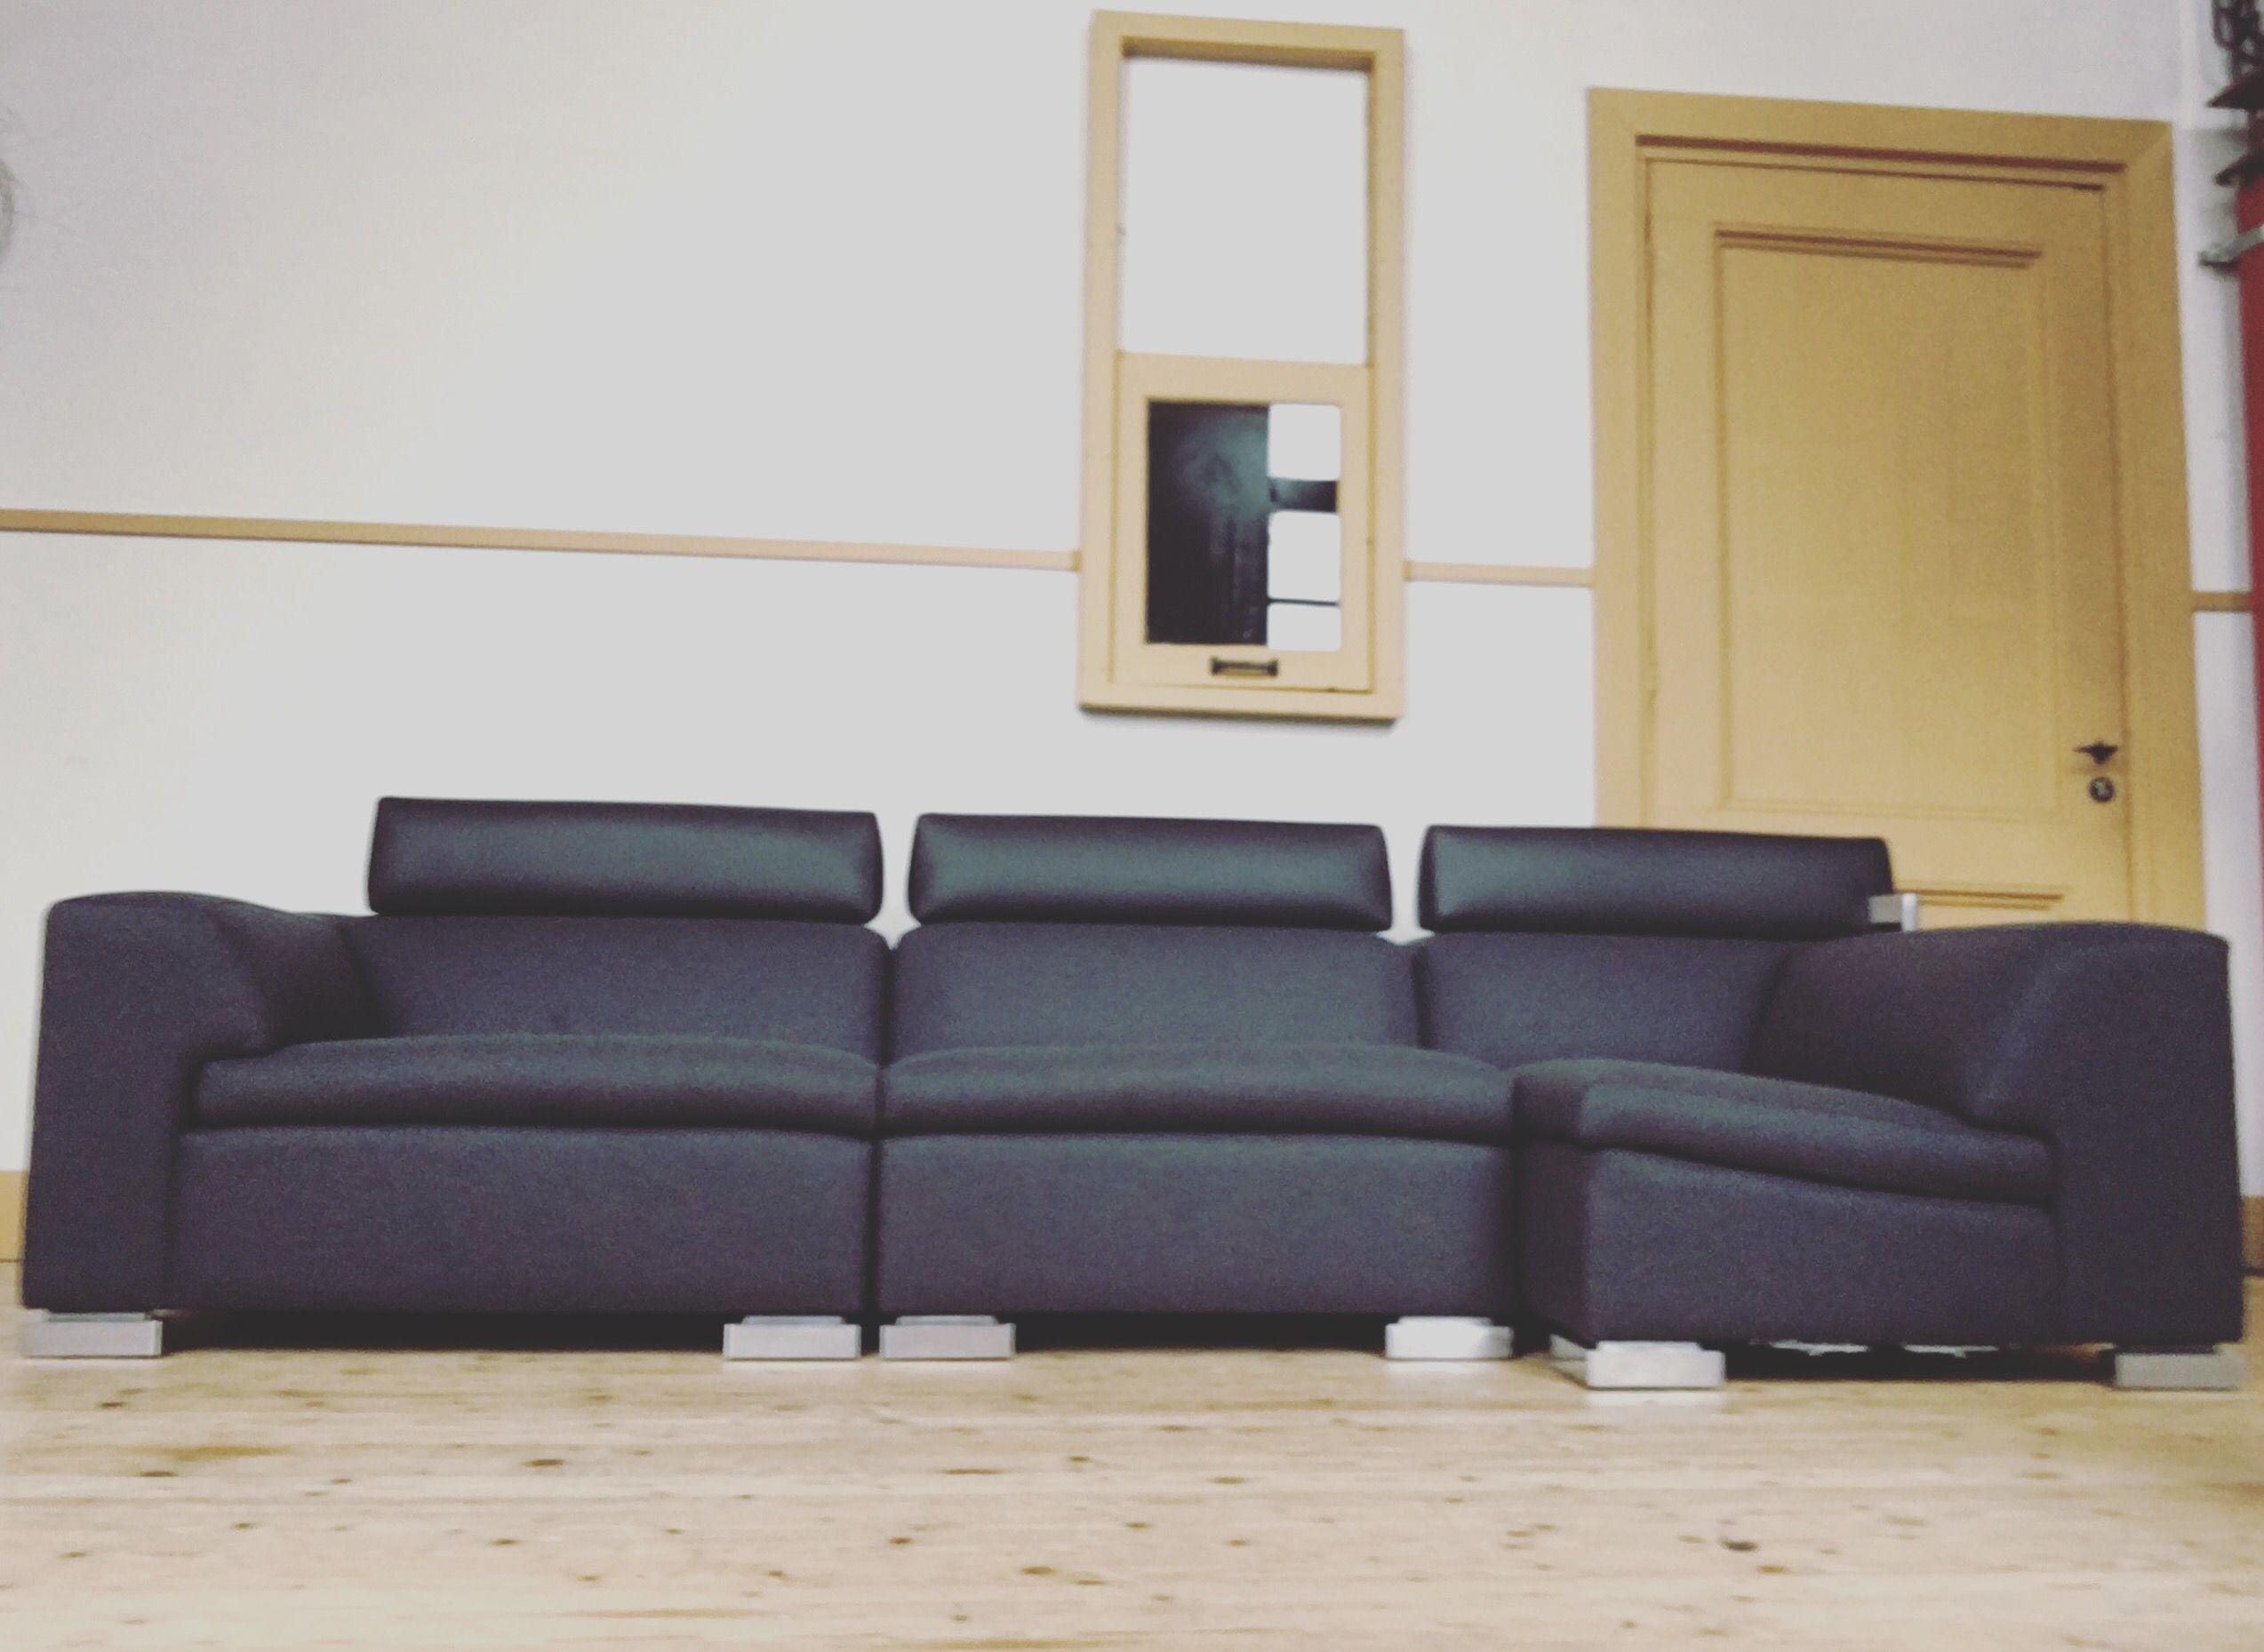 Leolux Howlazy sofa Upholstery Pinterest